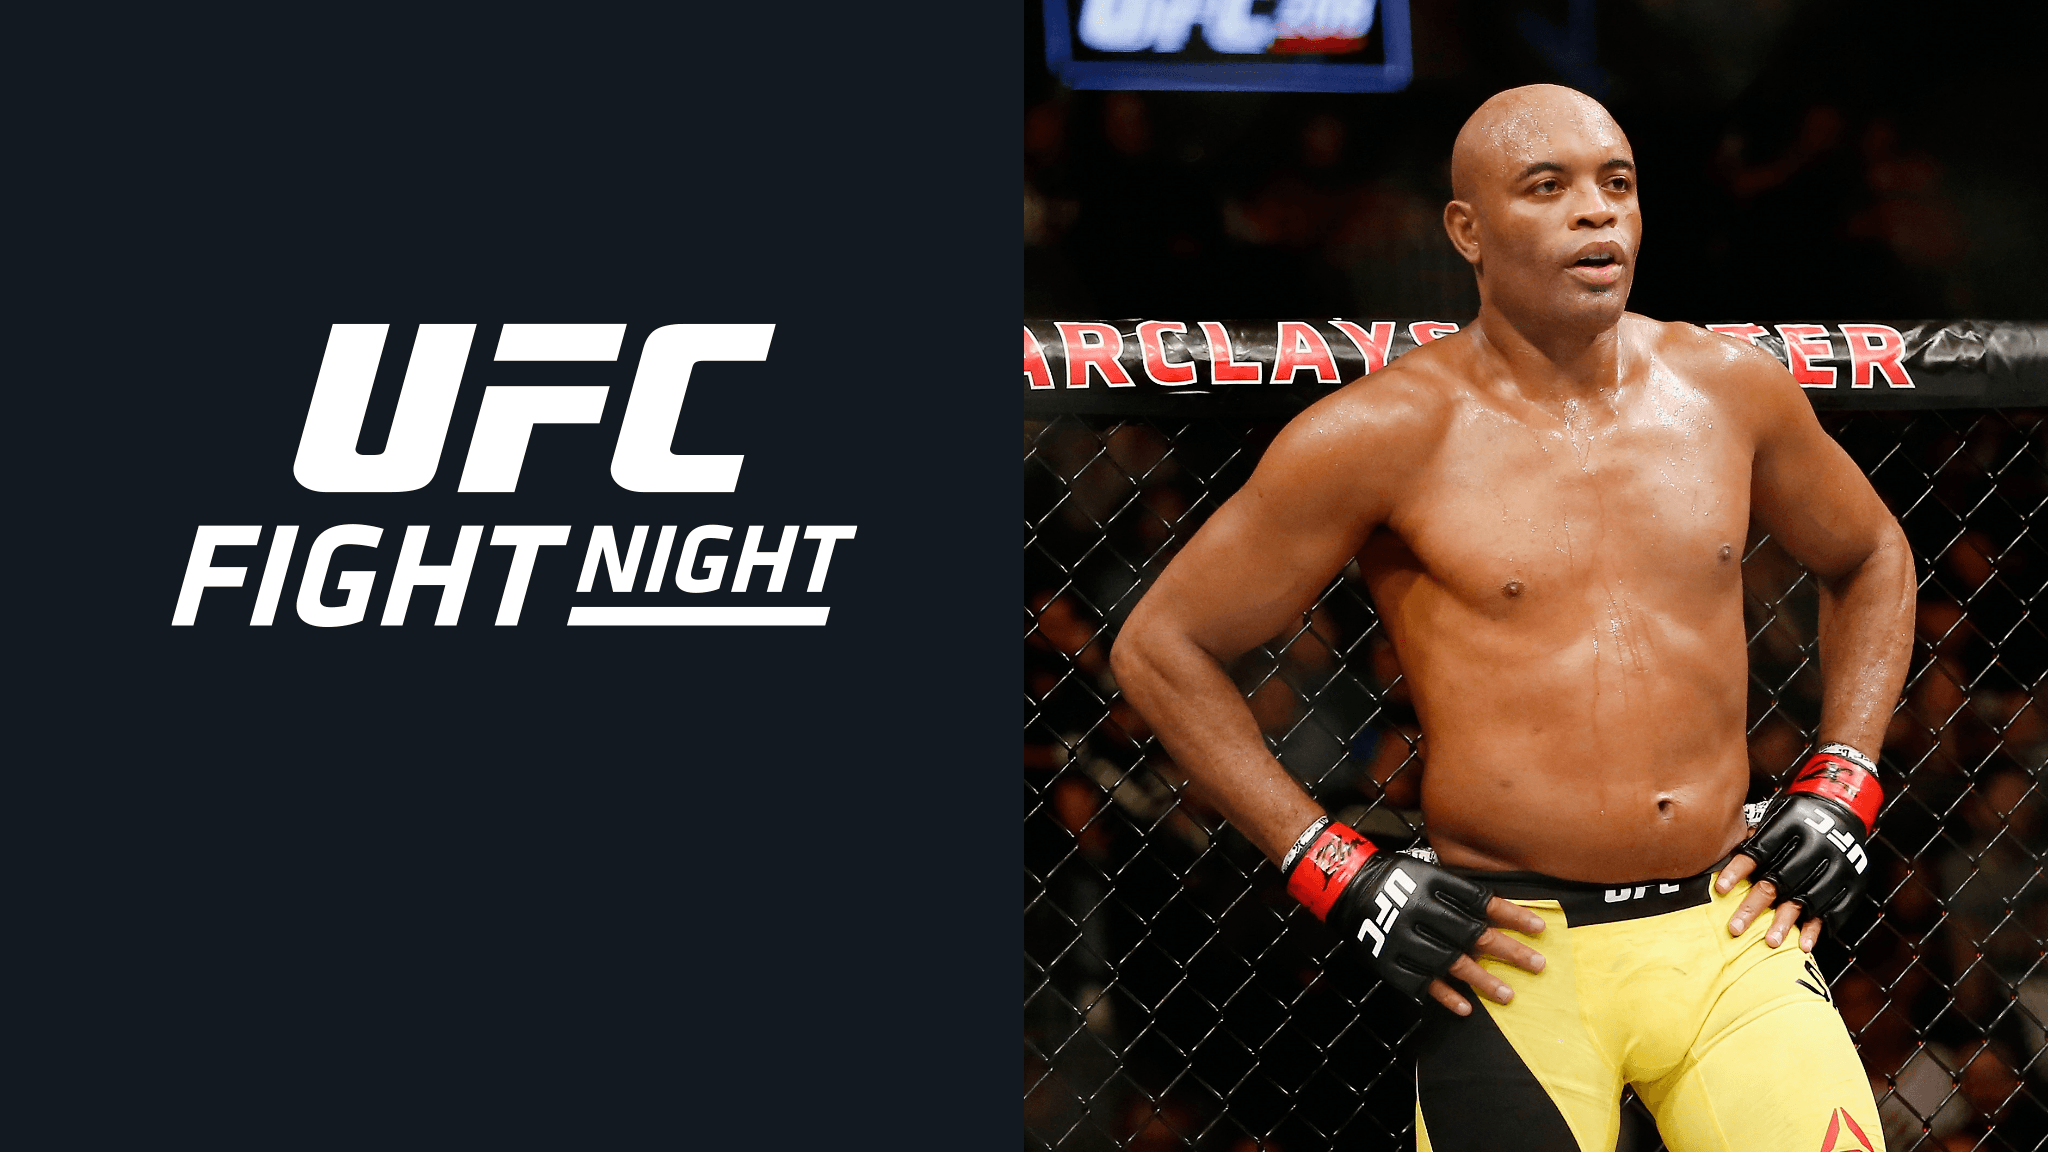 UFC Fight Night: Hall vs. Silva